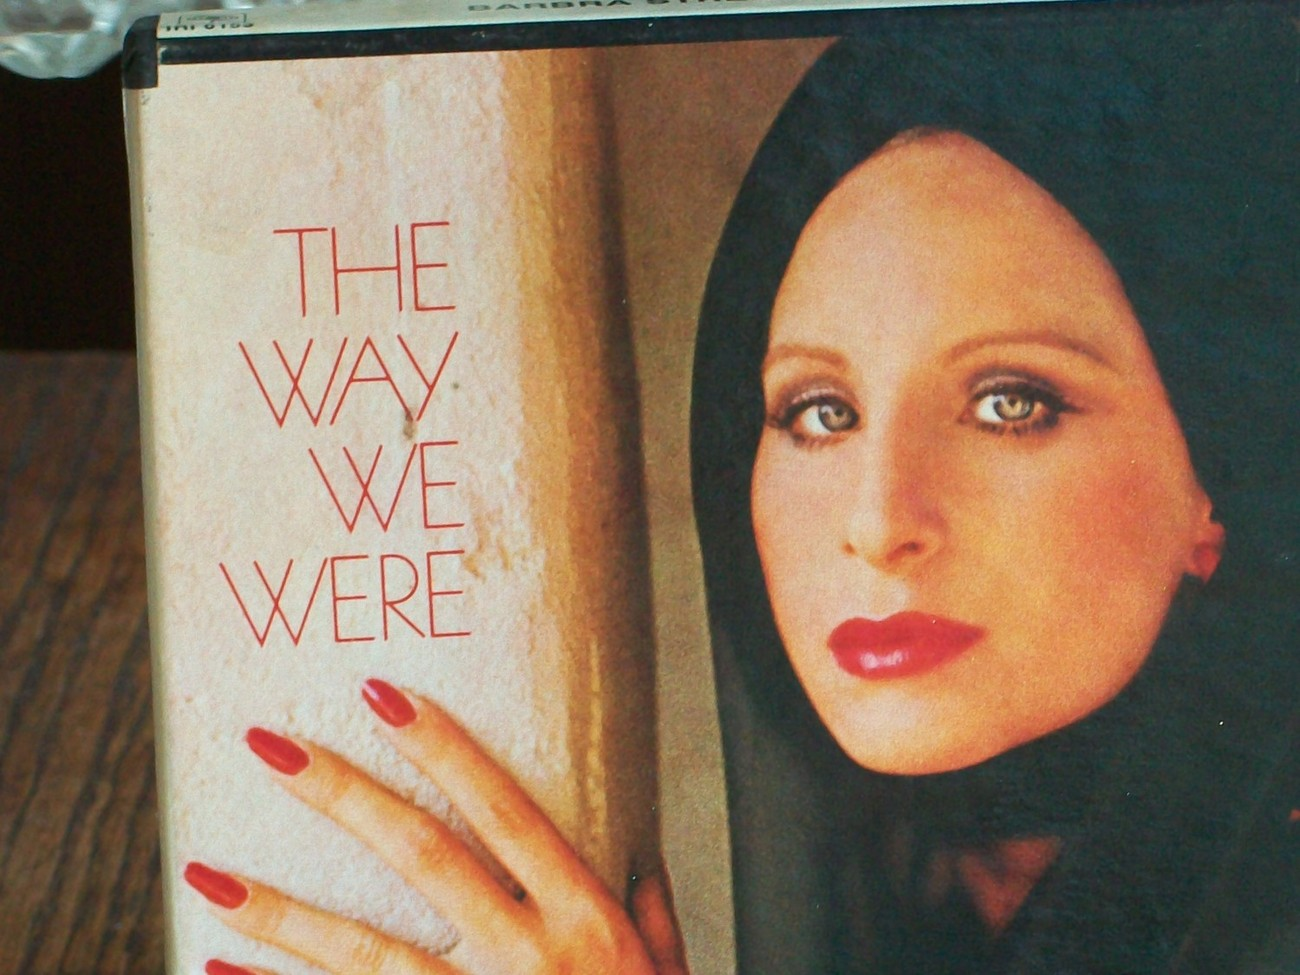 Streisand Reel to Reel Stereo Audio Tape